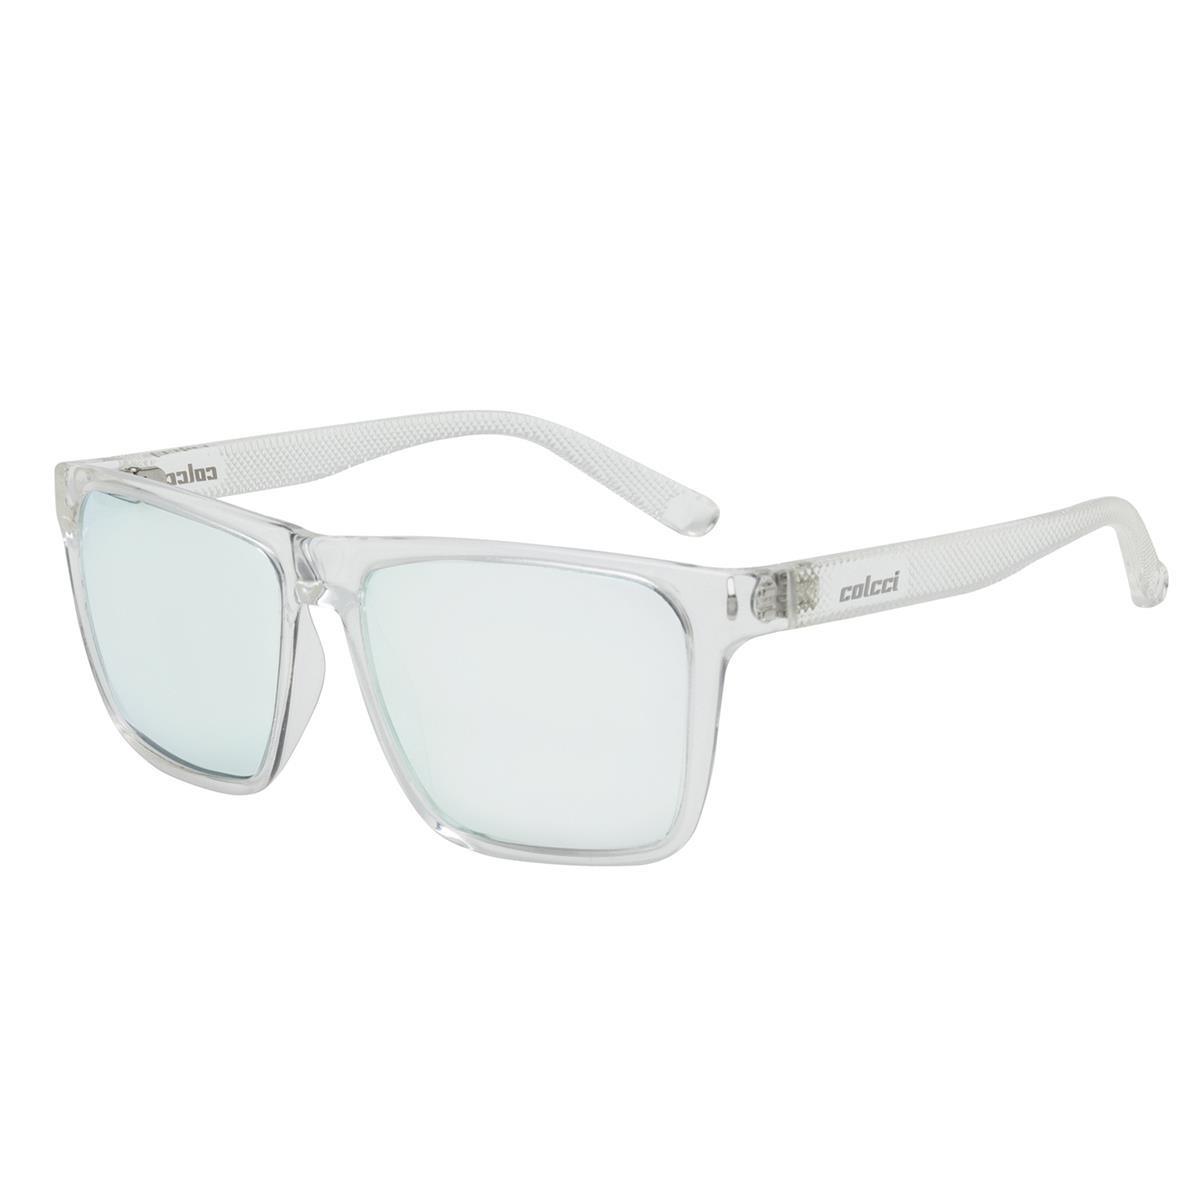 9bf493dad5afa Oculos De Sol Masculino Colcci C0062d8980 Paul Lente Prata - R  259,90 em